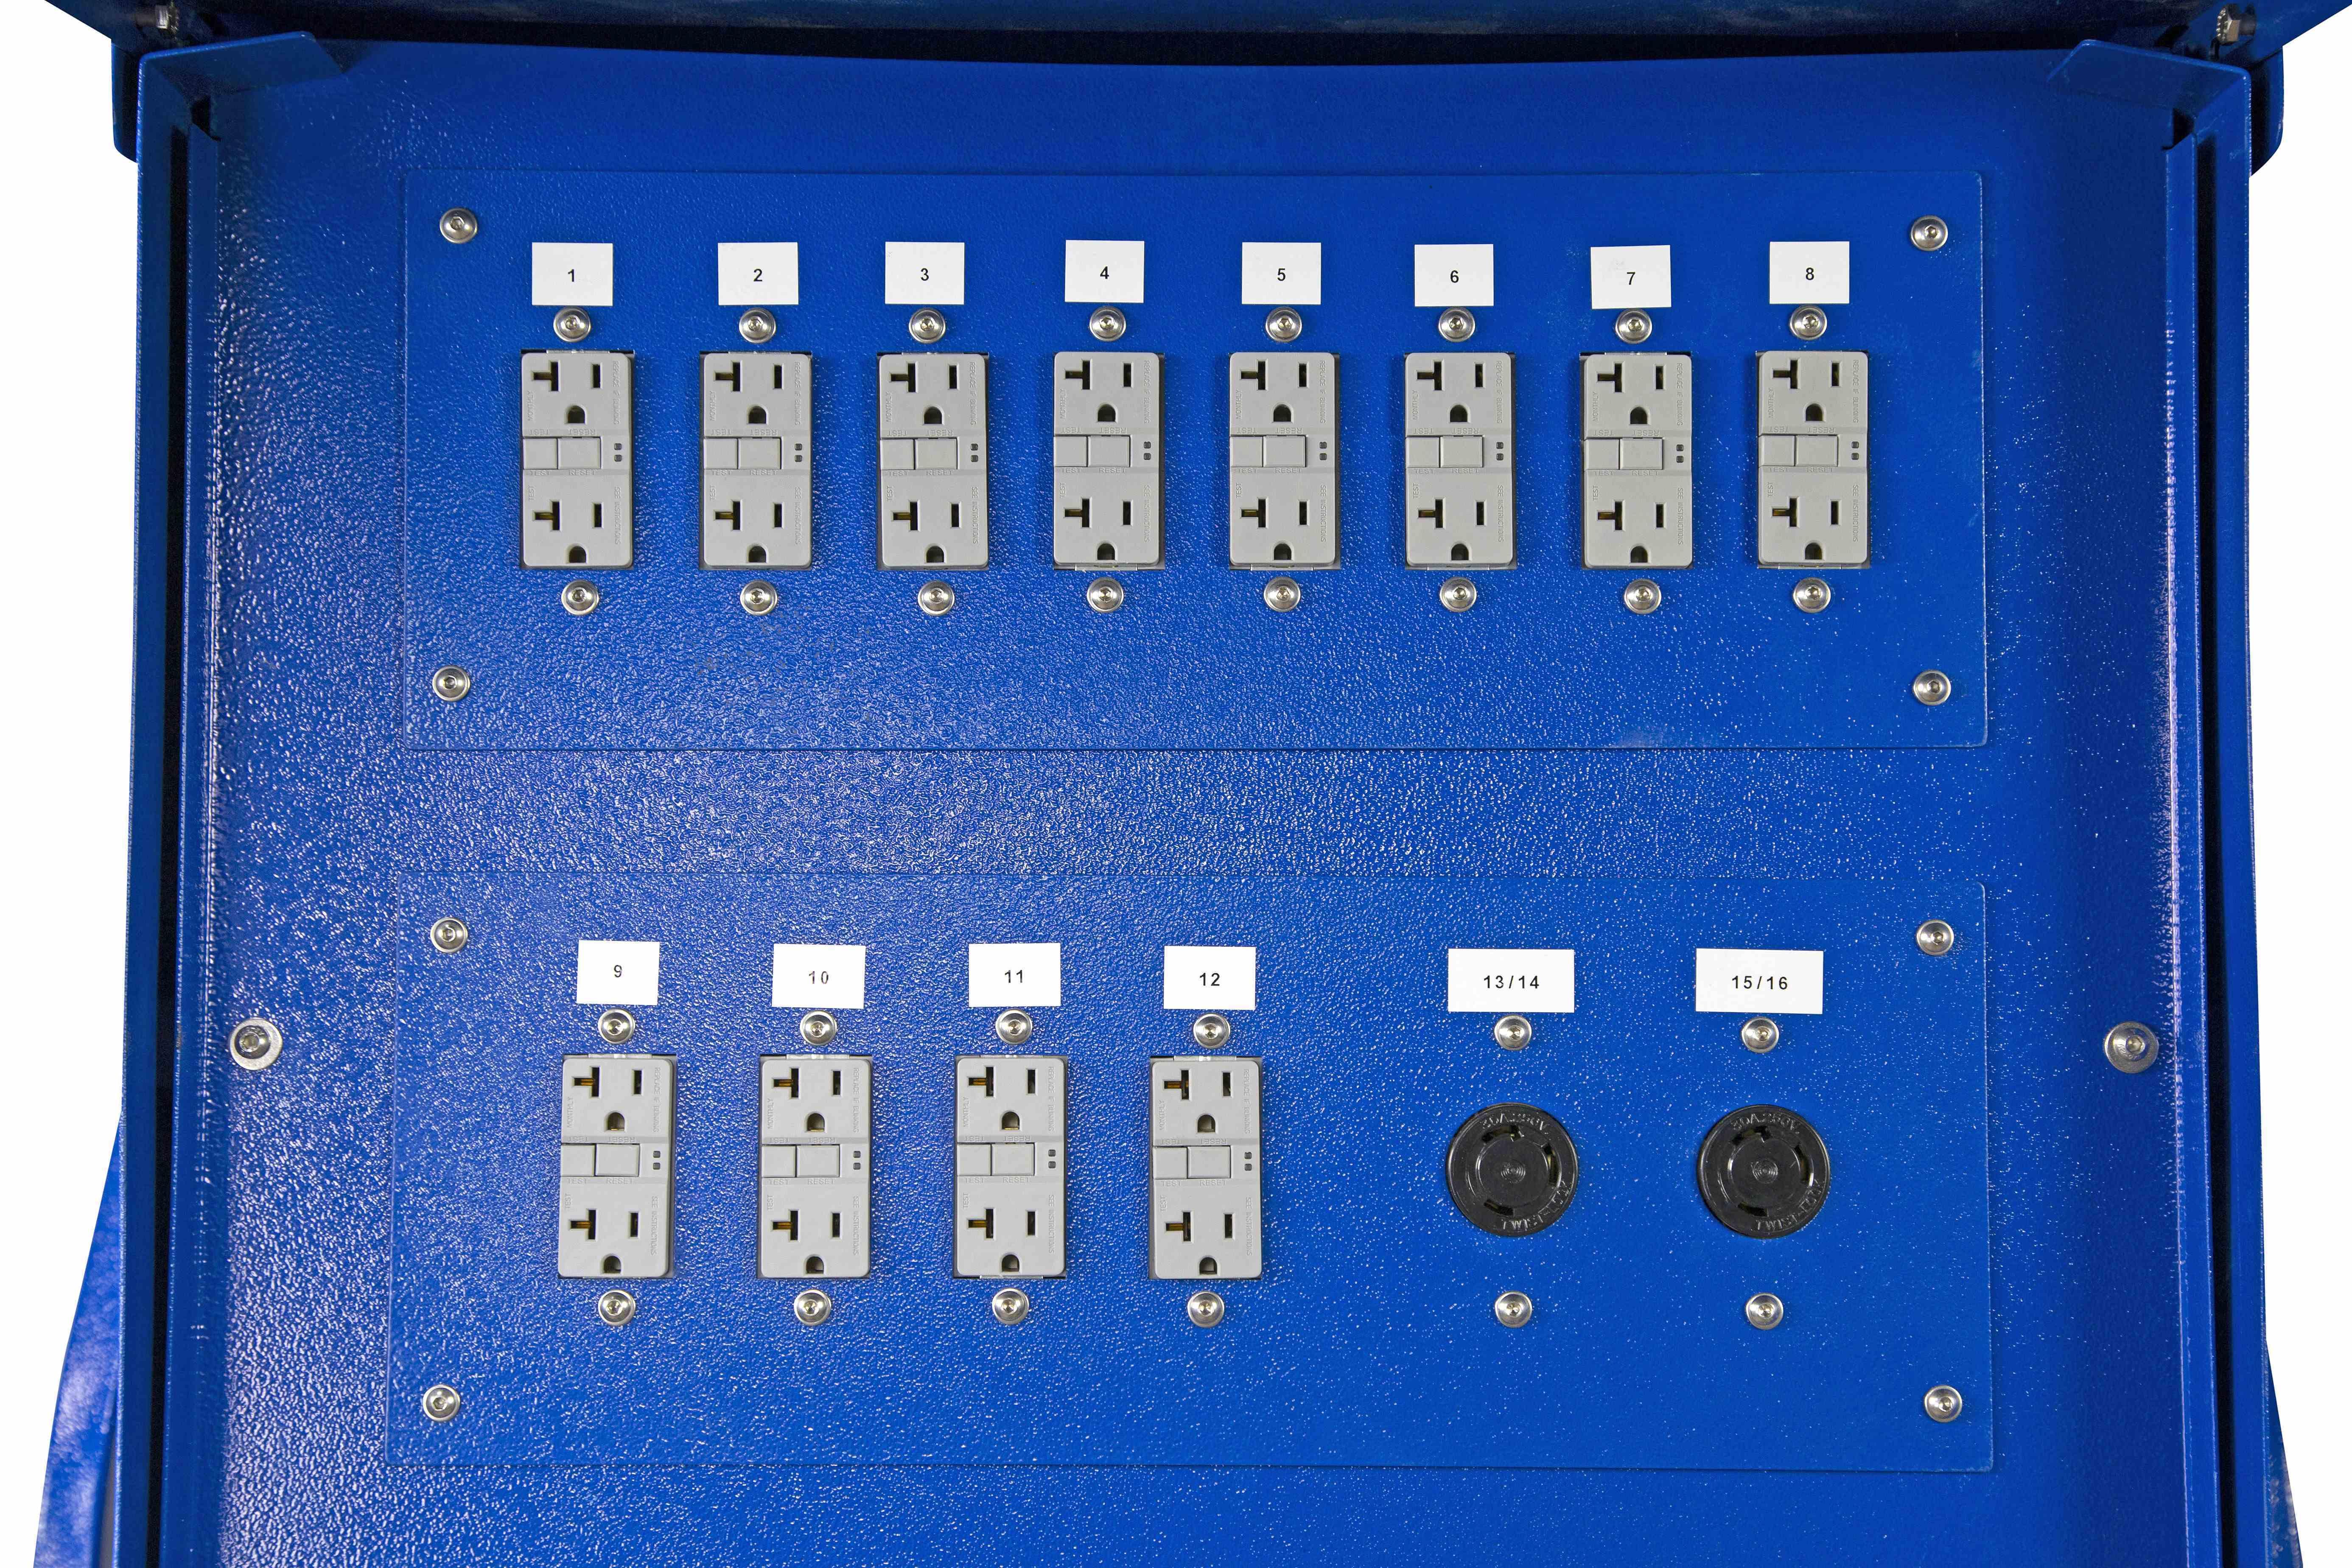 15 Kva Temporary Power Distribution 208v To 208y 120v 3ph 8 5 Wiring Diagram 3 Phase Panel 120 Hi Res Image 6 Breaker